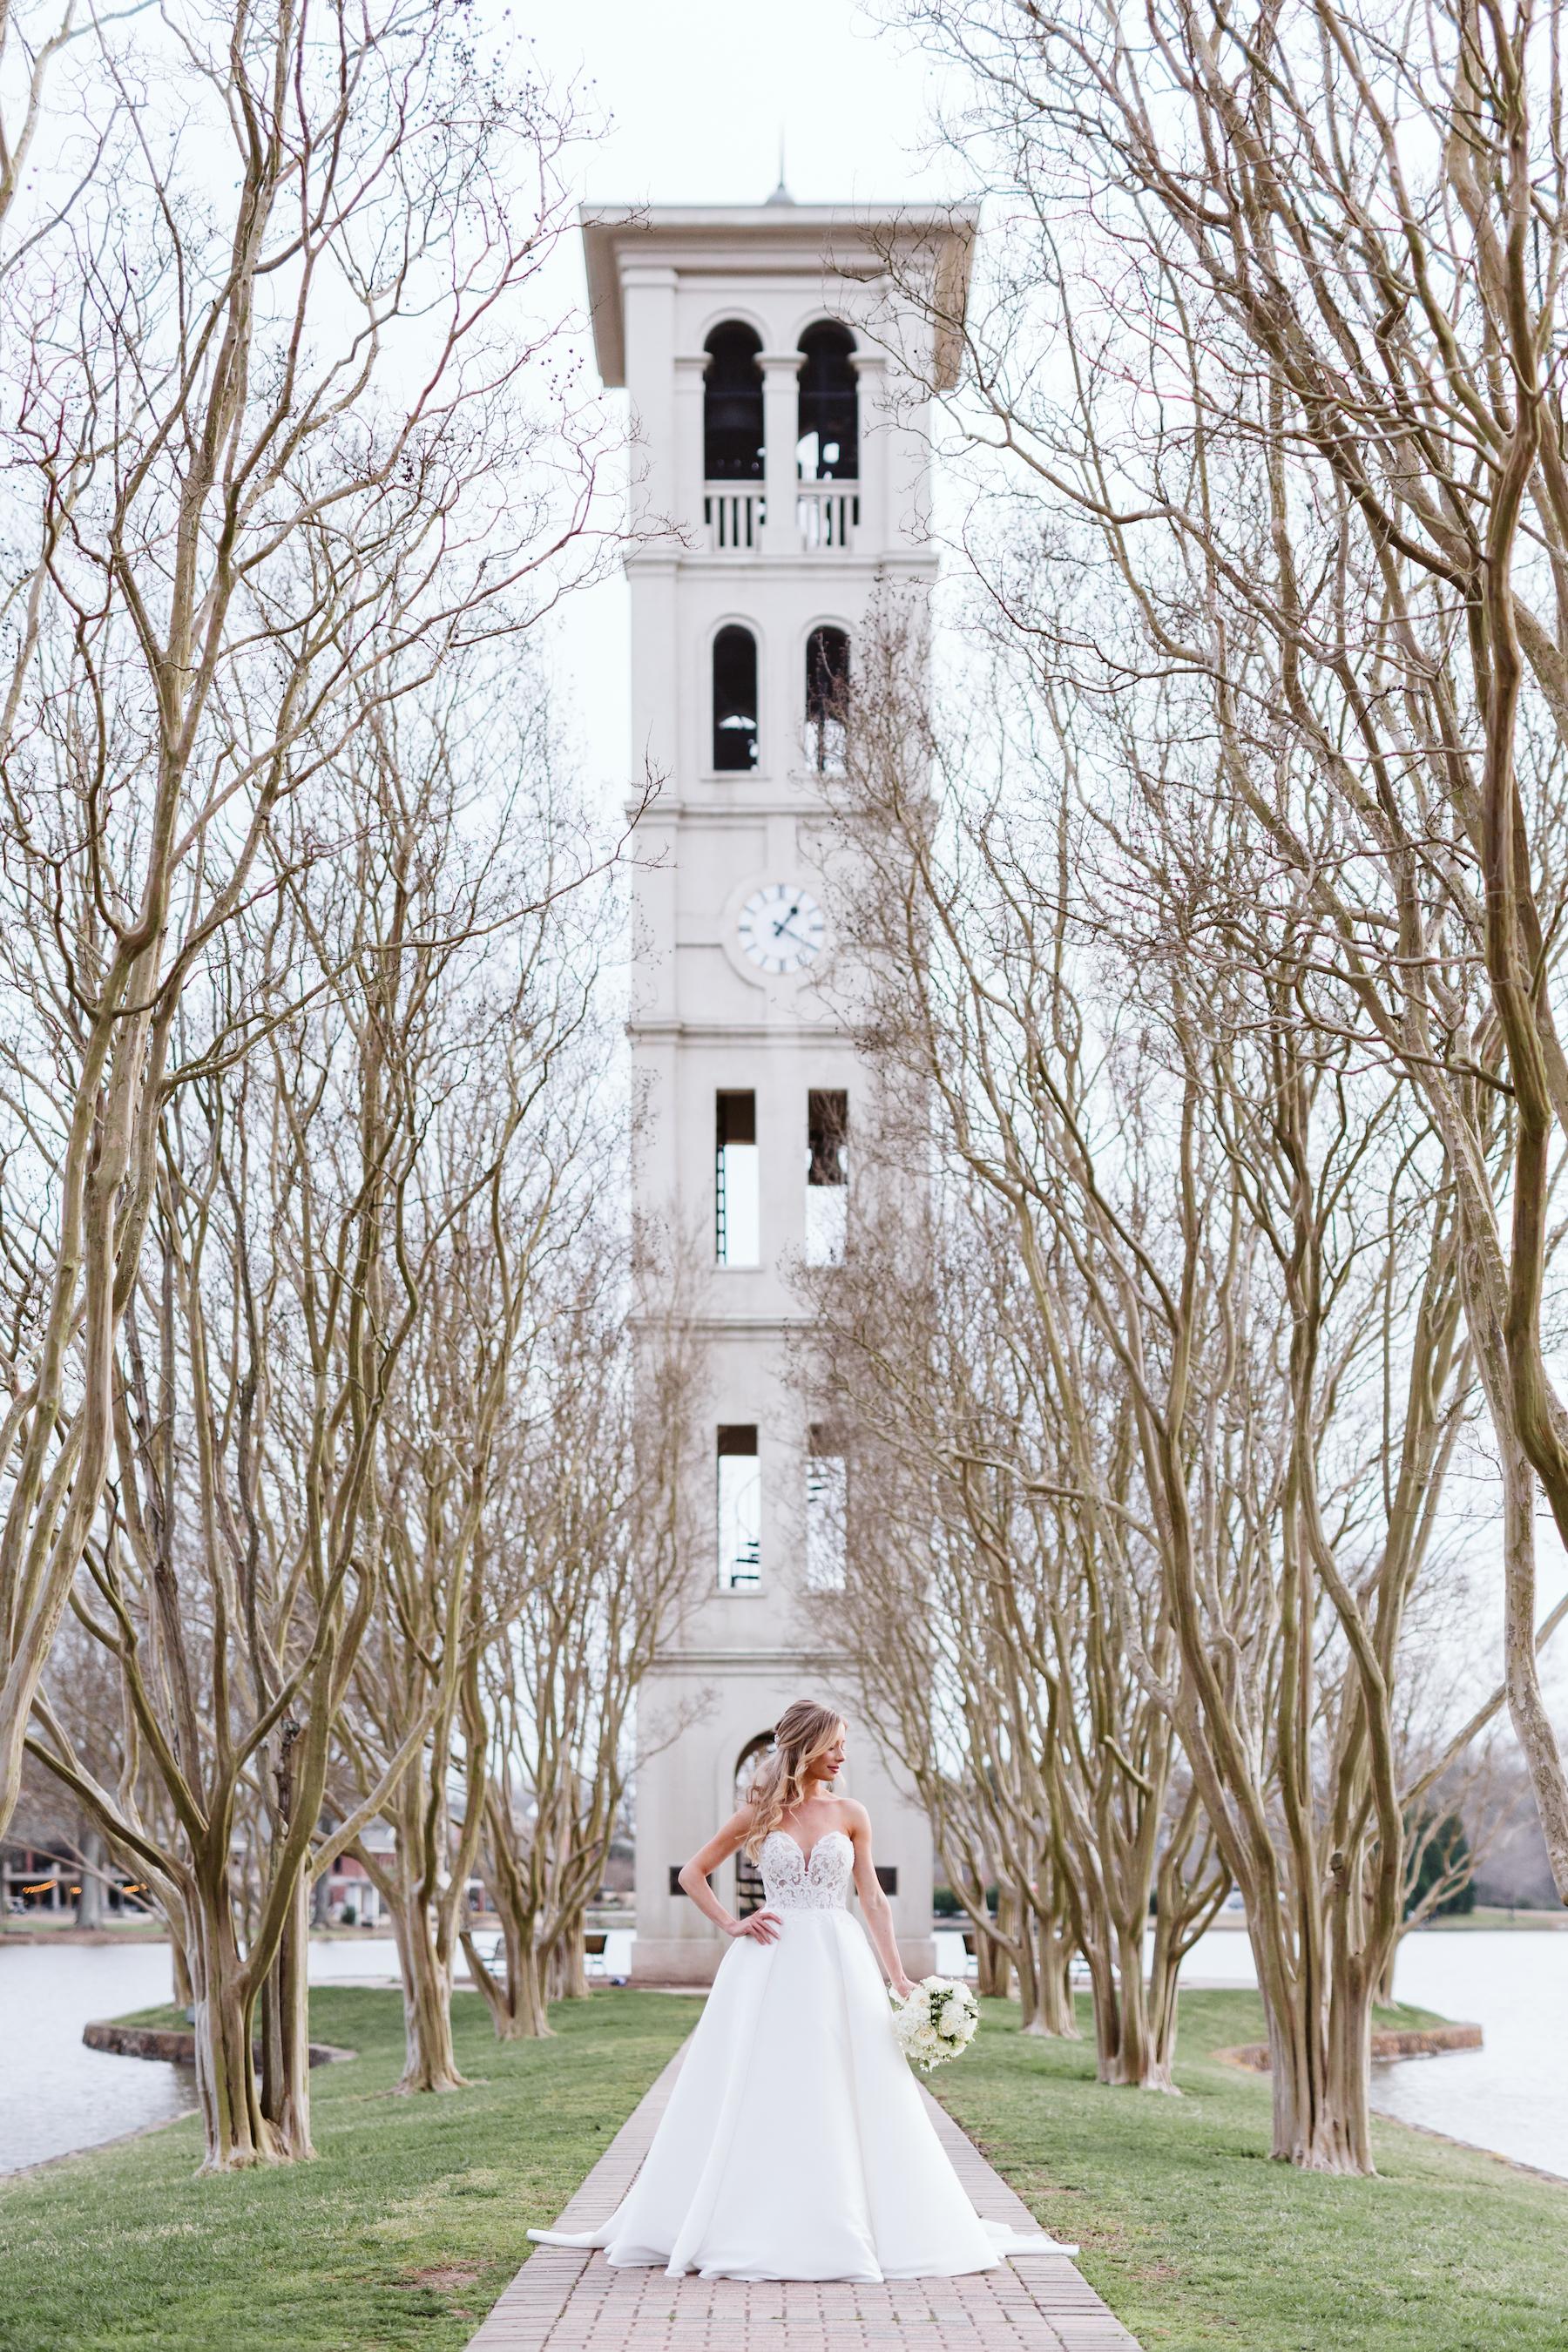 furman-university-bridals-paige-207.JPG